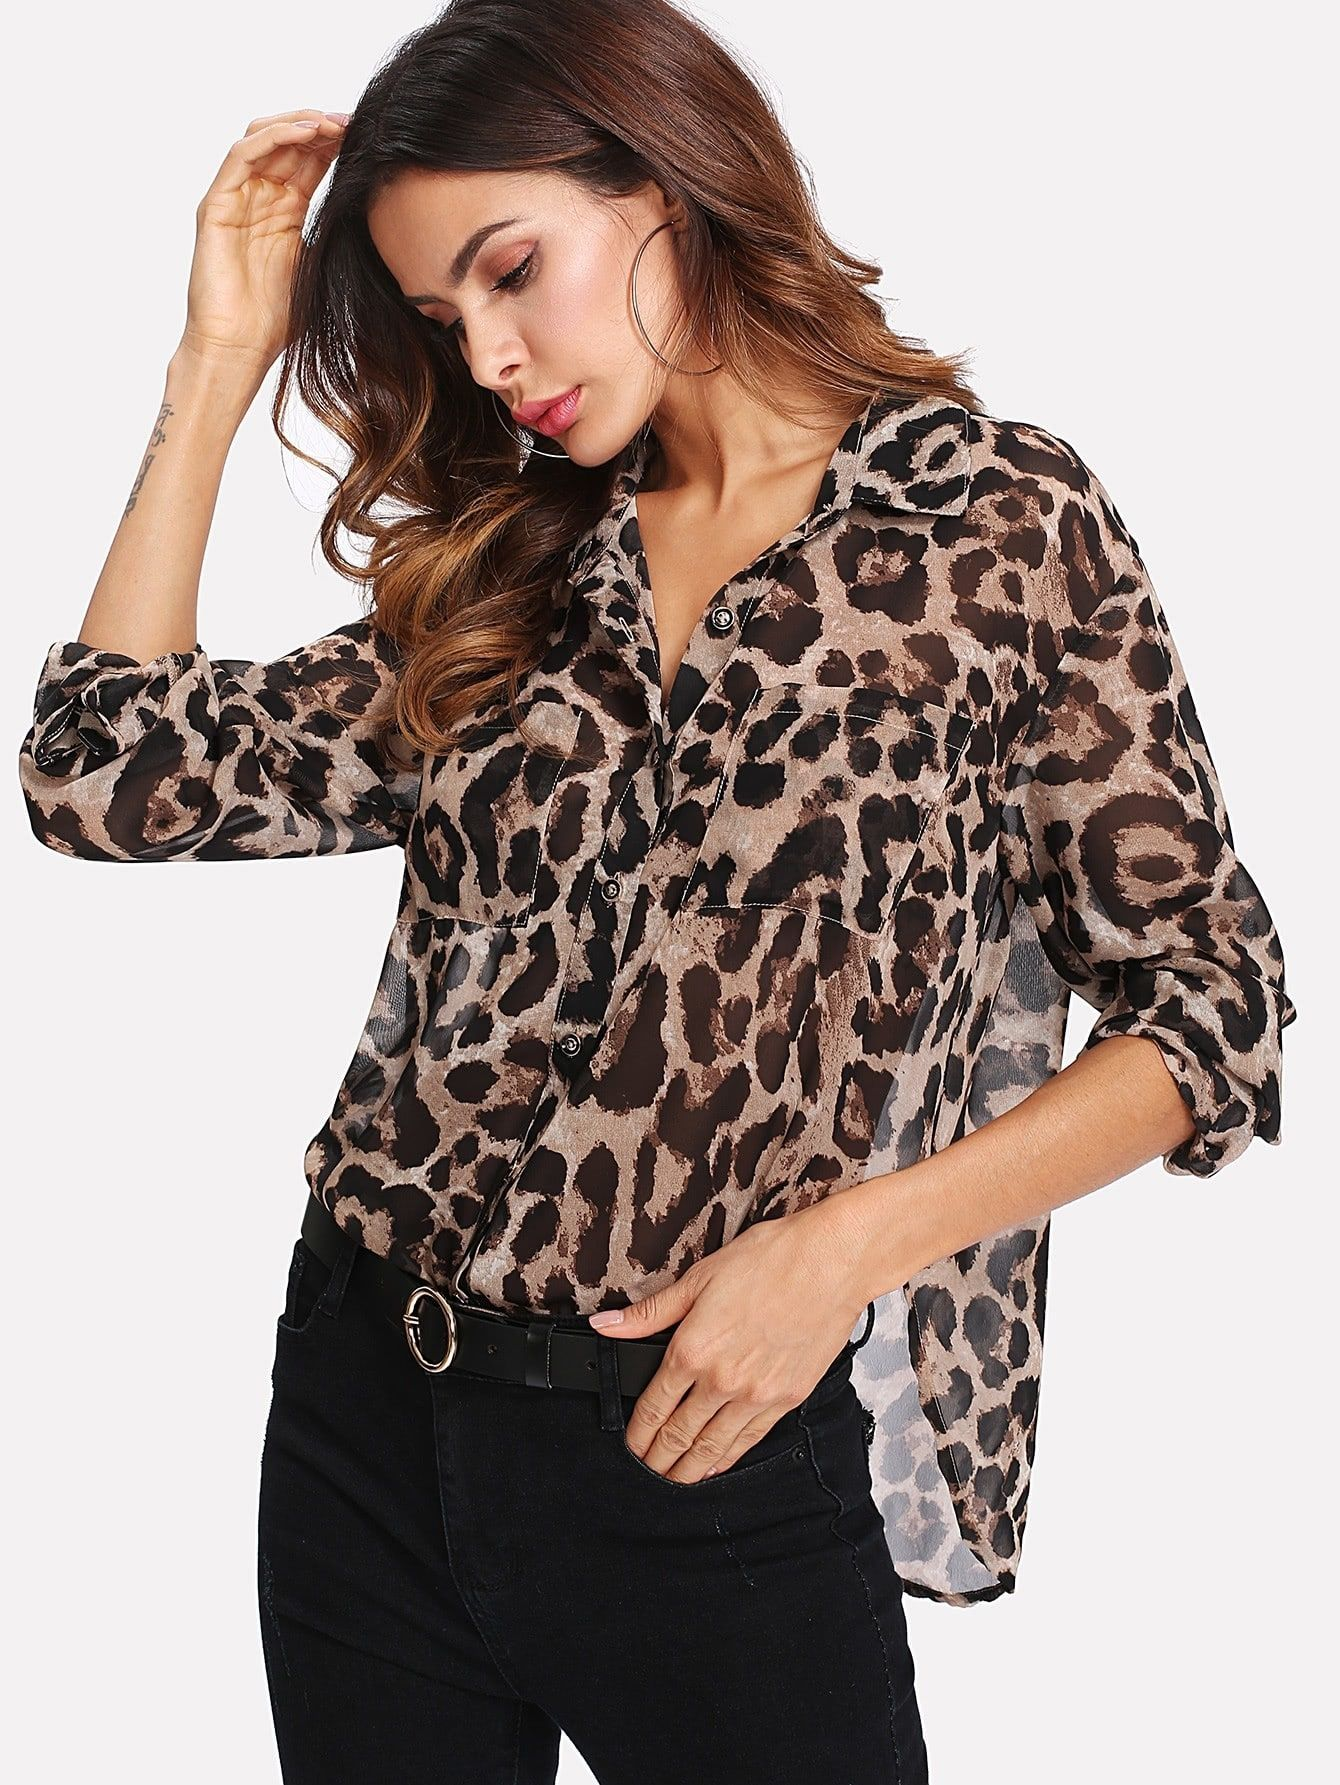 Curved Hem Leopard Semi Sheer Utility Shirt Trendy Outfits Leopard Print Shirt Printed Chiffon Blouse Print Chiffon [ 1785 x 1340 Pixel ]